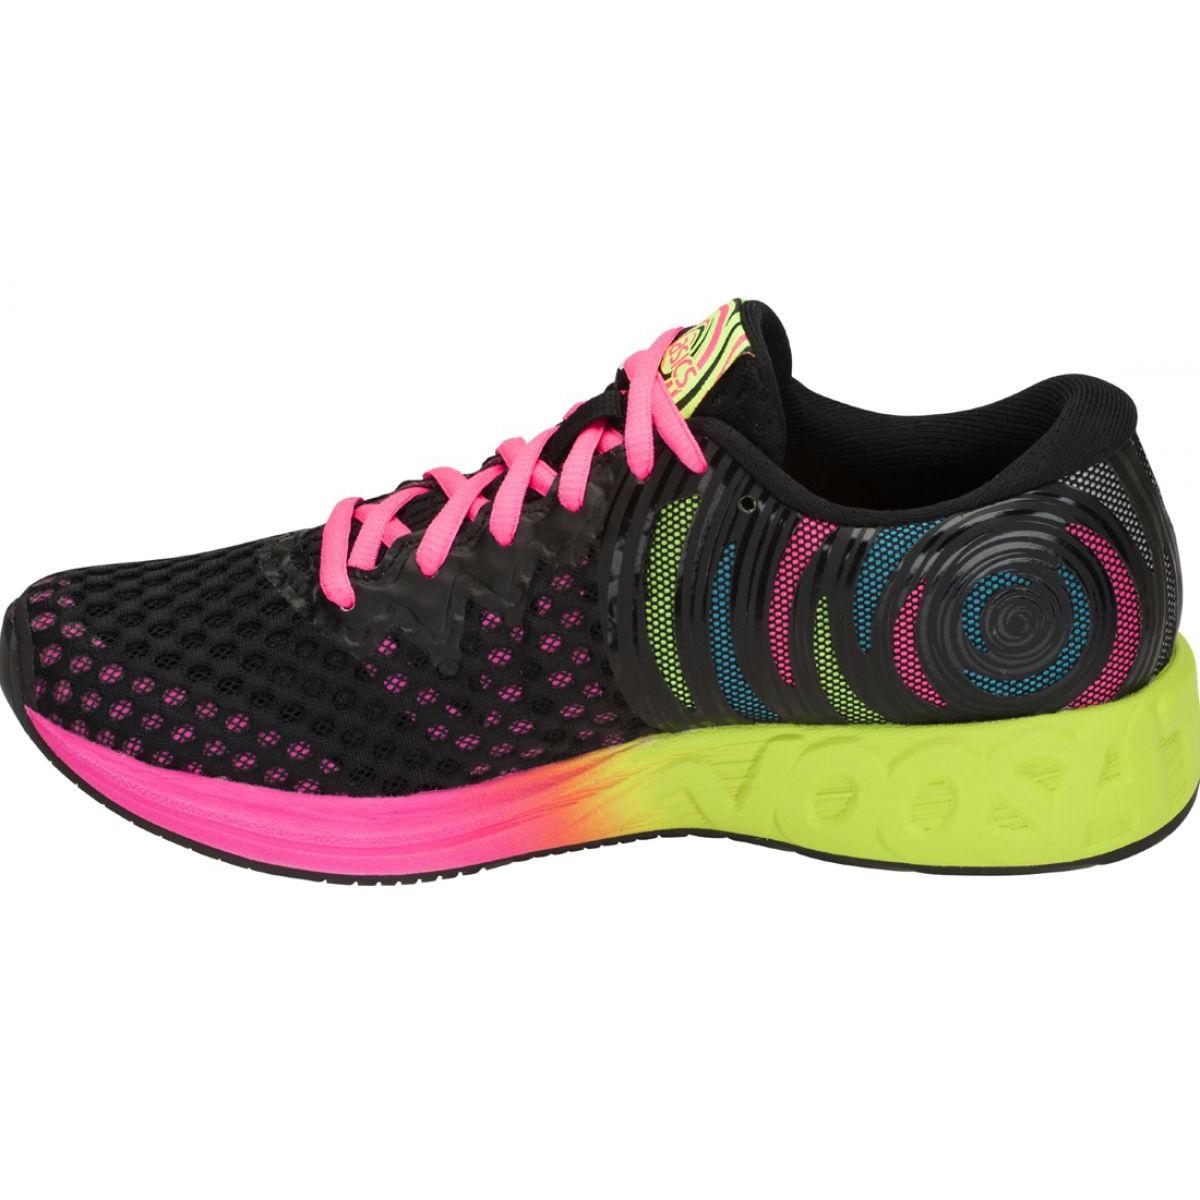 Asics Gel-Noosa Ff 2 W T869N-001 running shoes black multicolored